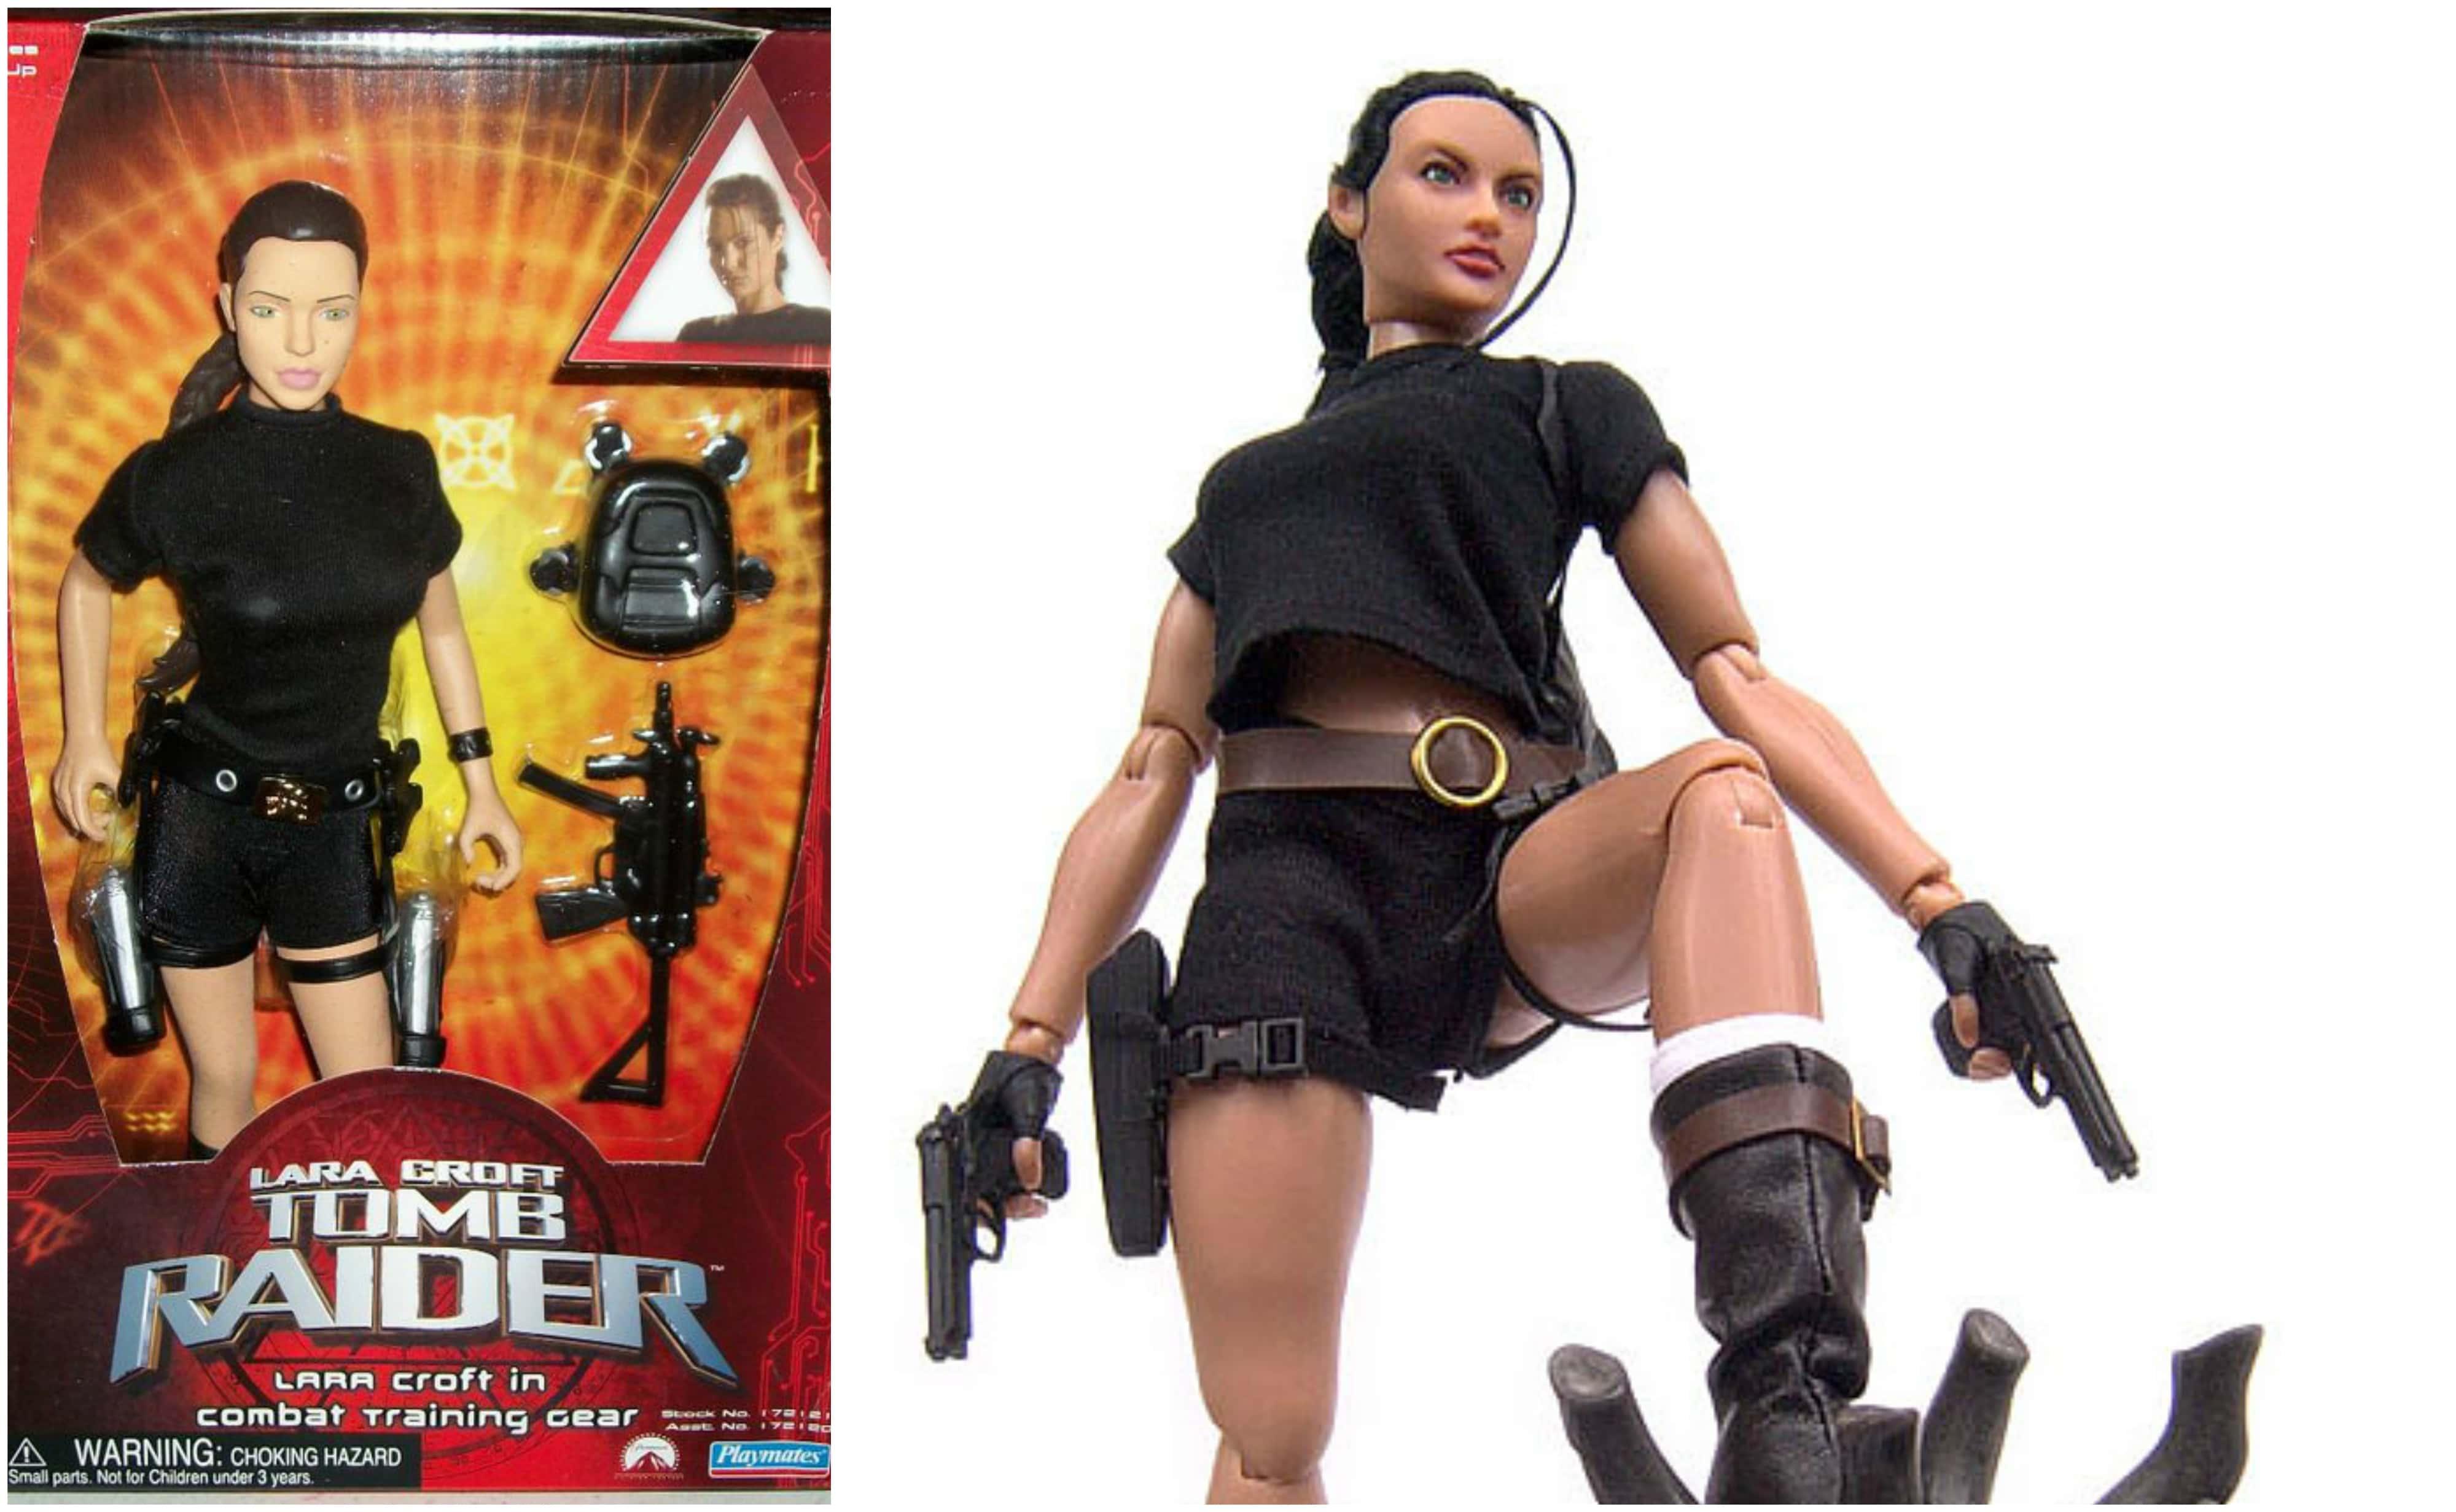 Tomb Raider facts